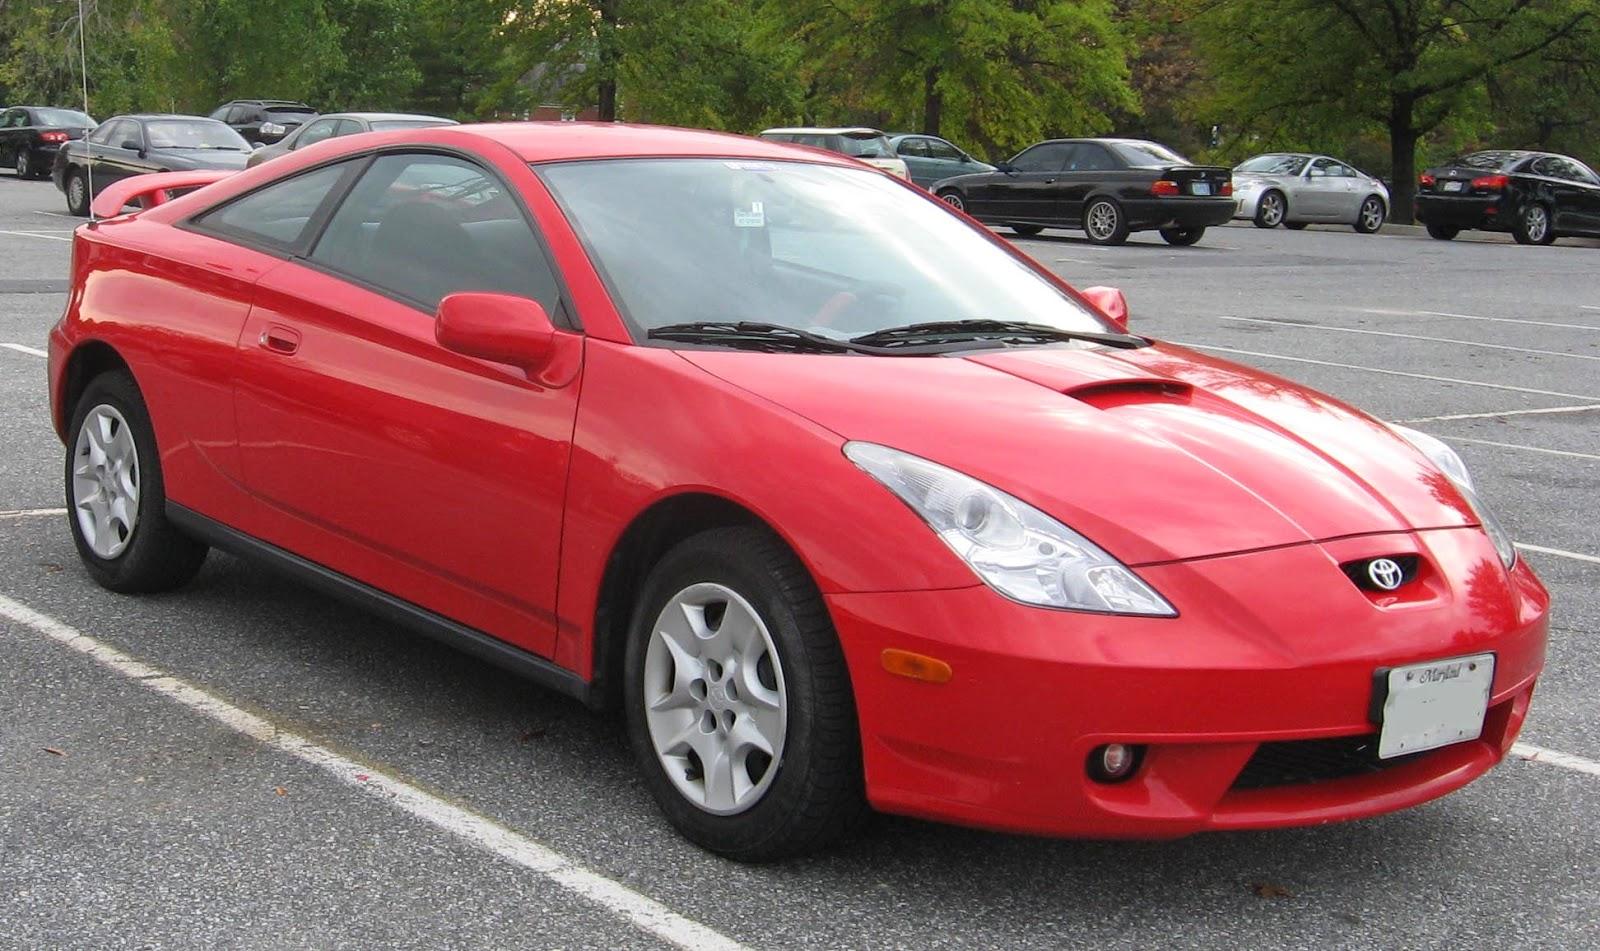 Modifikasi Toyota Celica Terbaik